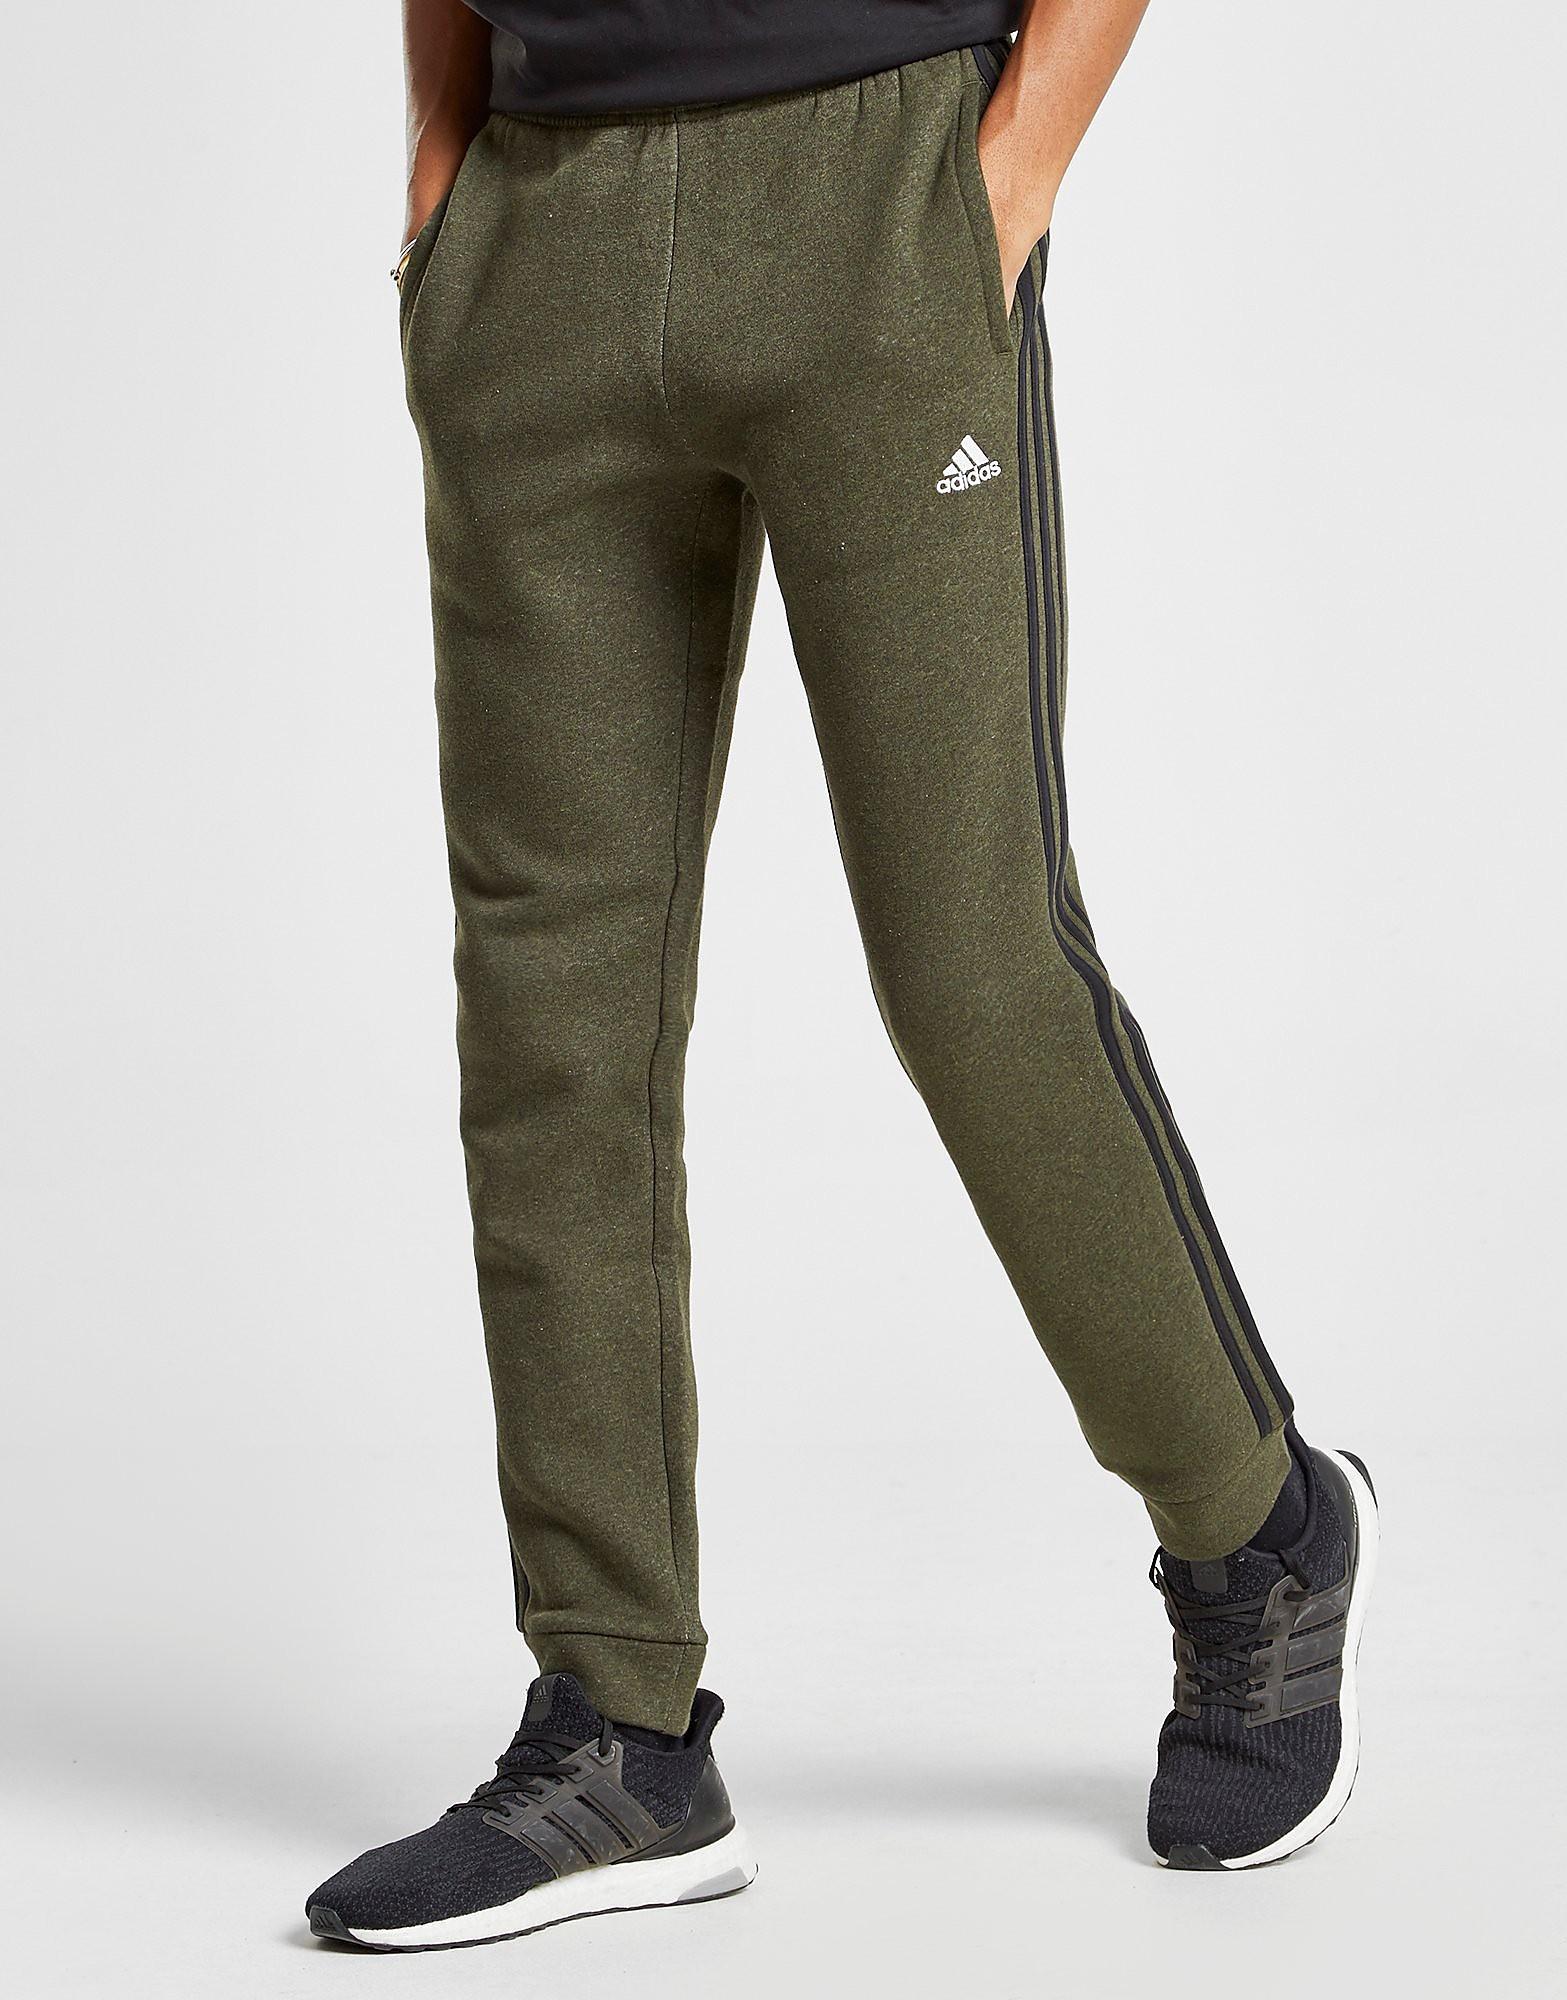 Adidas Condivo 12 Træningsbukser adidas træningsbukser - herrer | jd sports